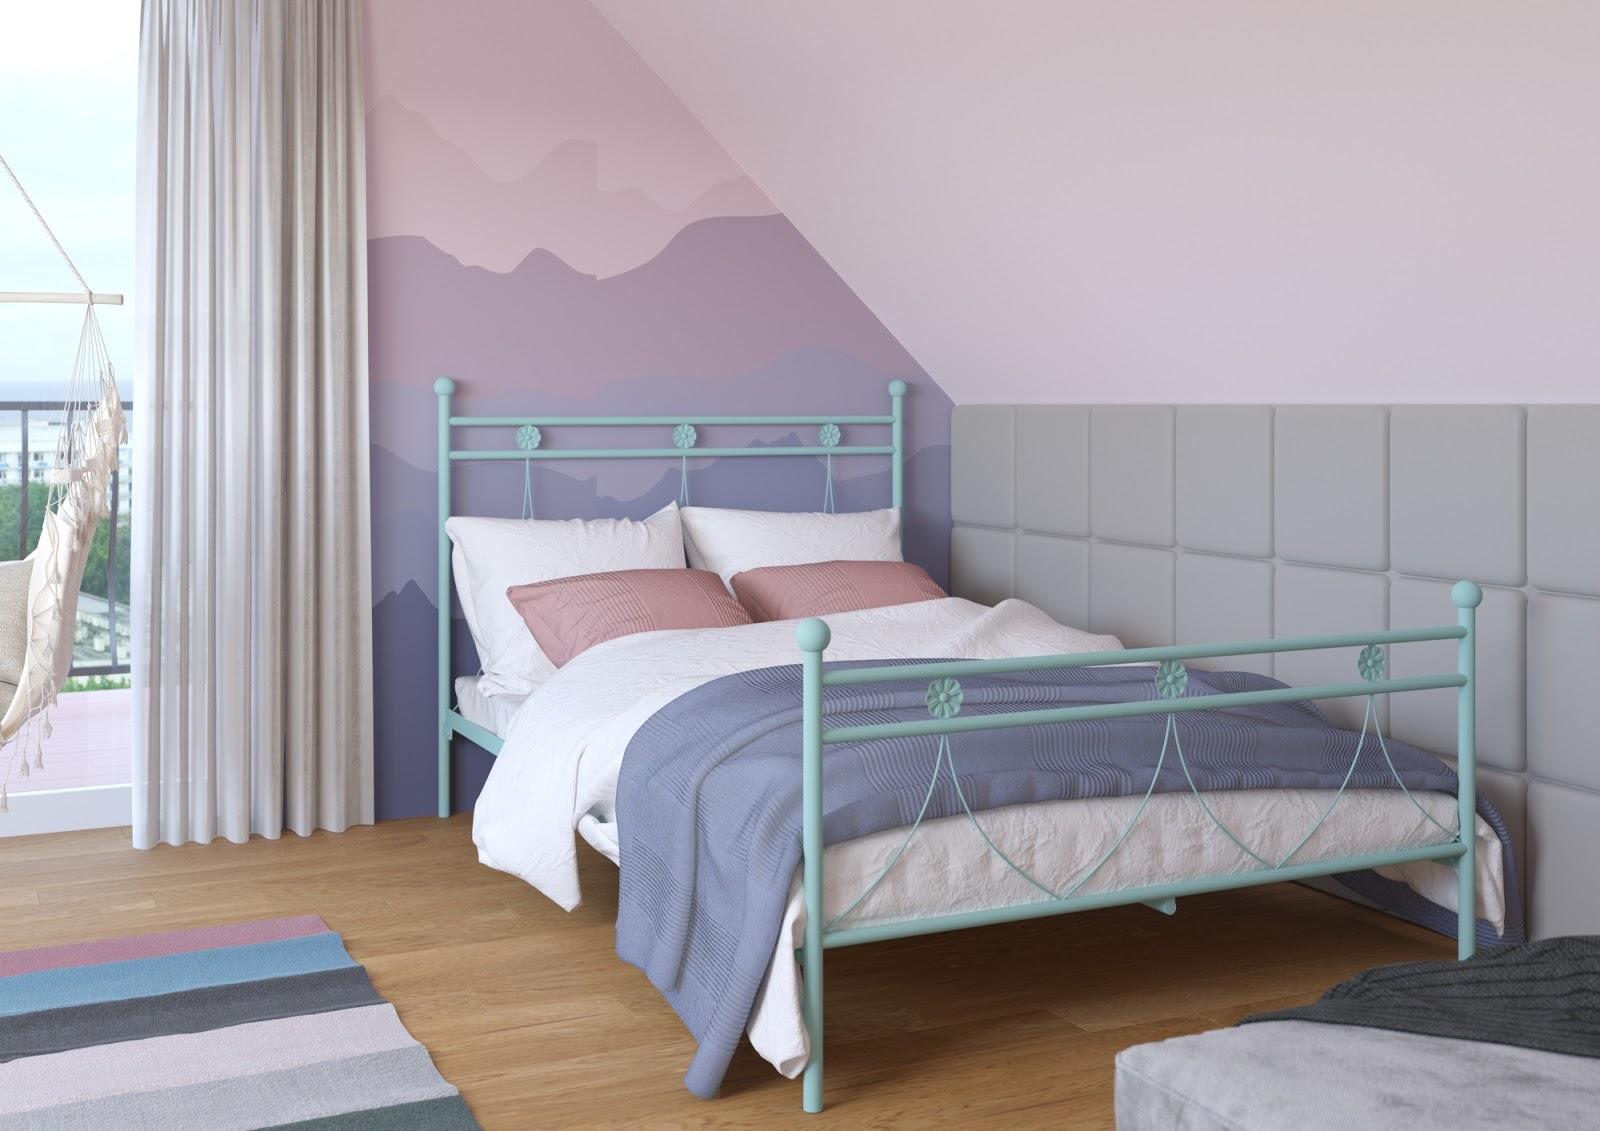 Łóżko metalowe wzór 37 (100-140 cm)